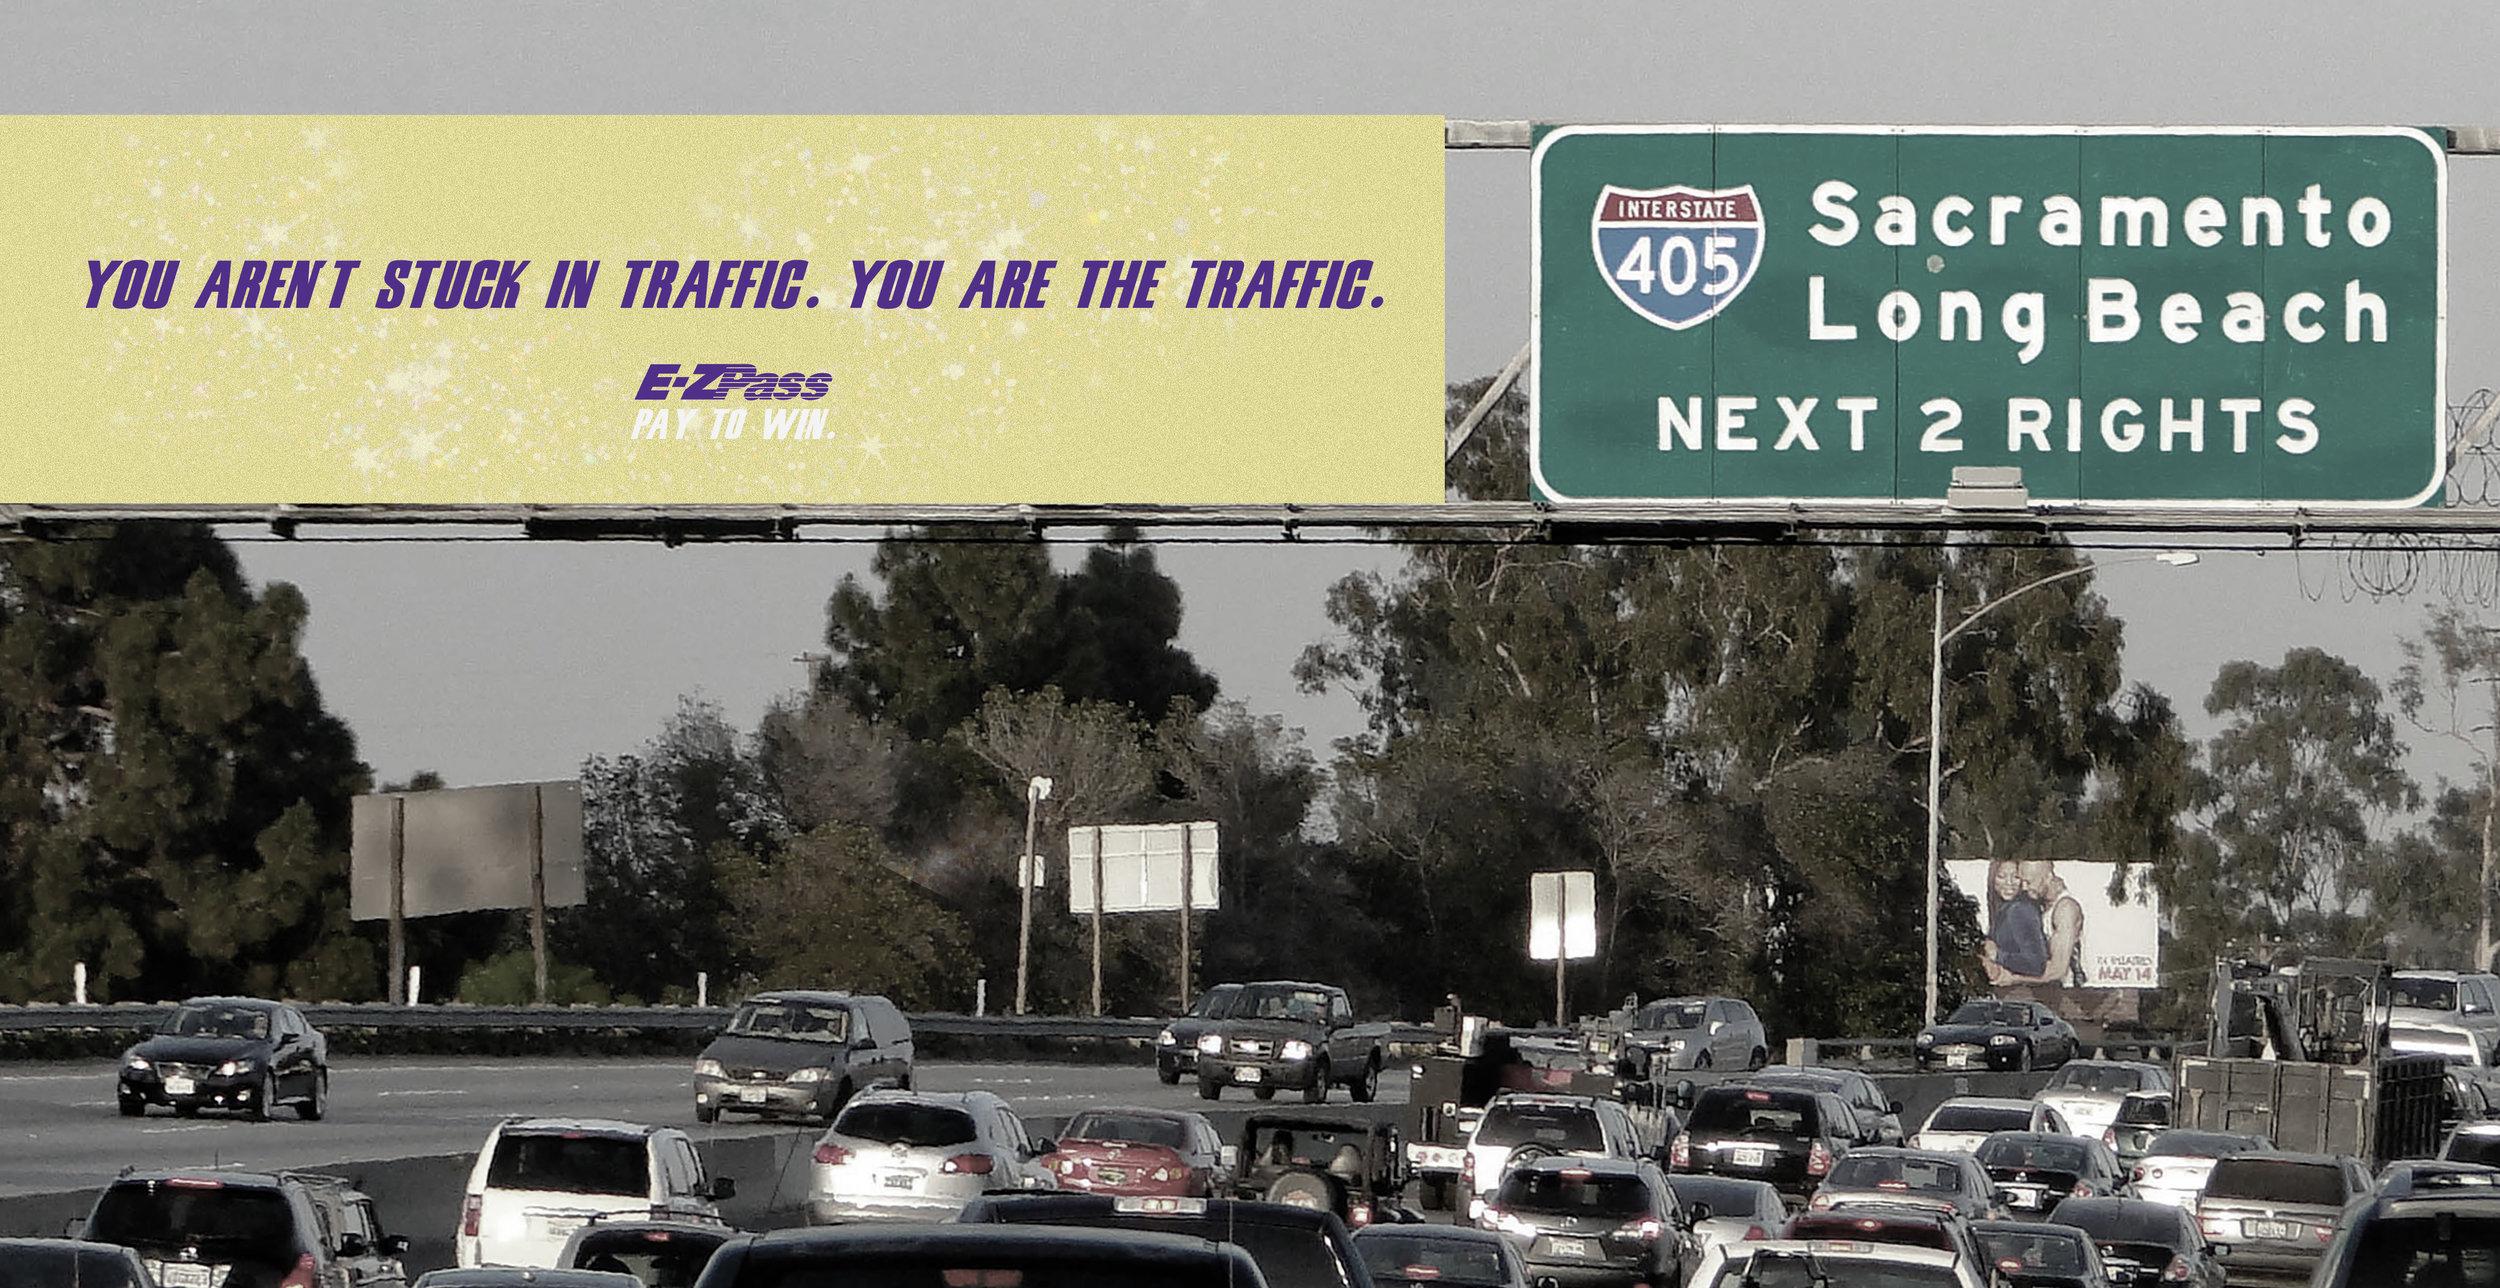 ezpass_billboard2.jpg